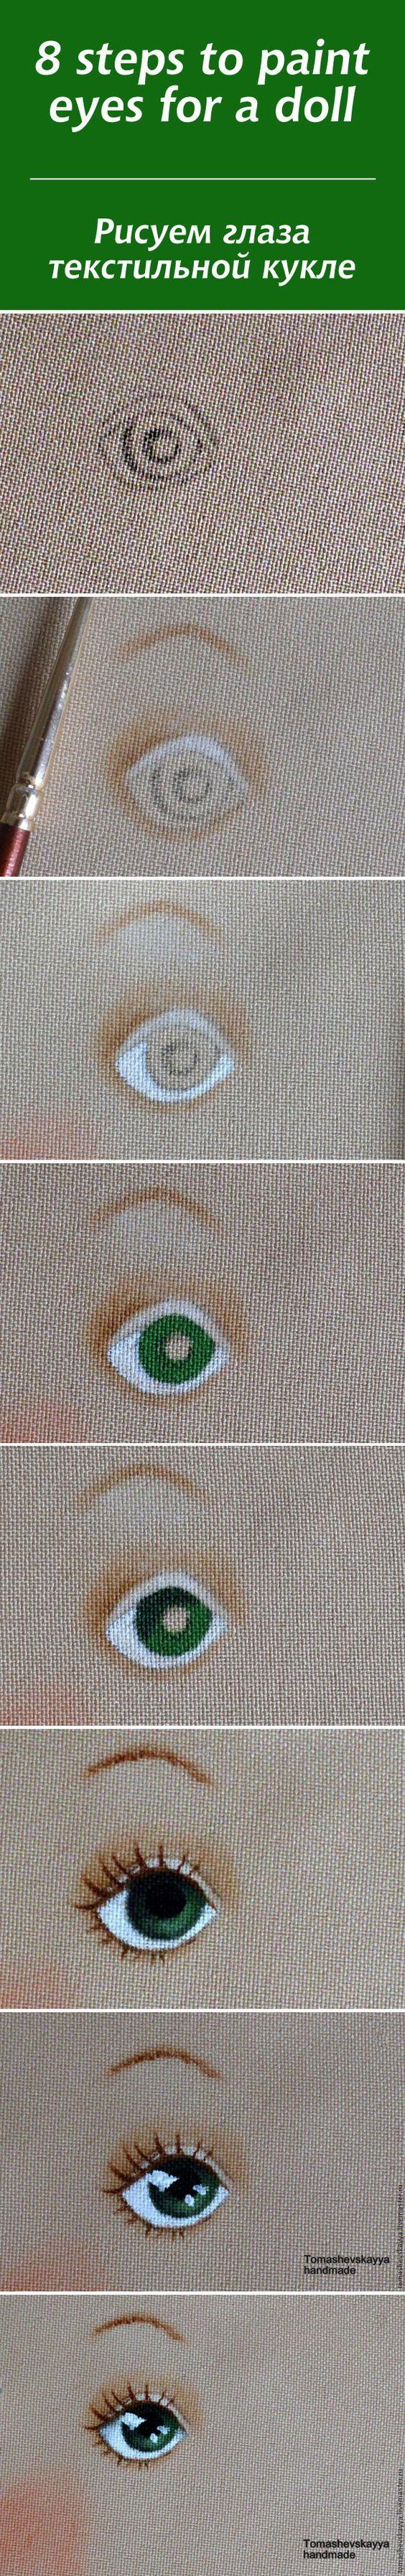 Как нарисовать глаза кукле 8 steps to paint eyes for a doll: